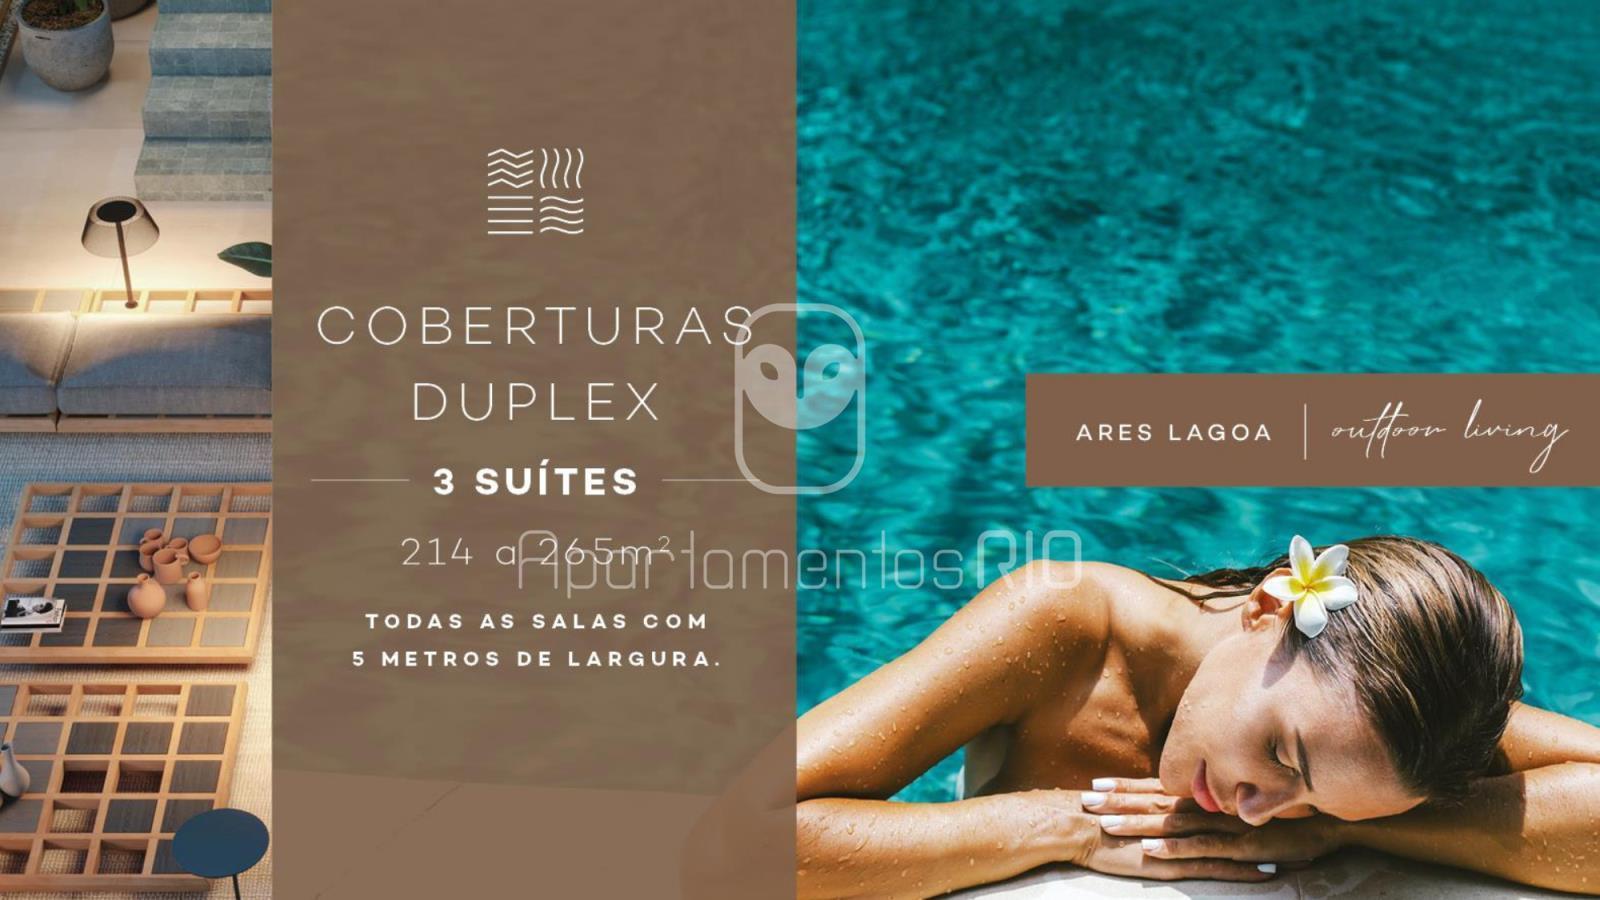 Ares Lagoa Outdoor Living